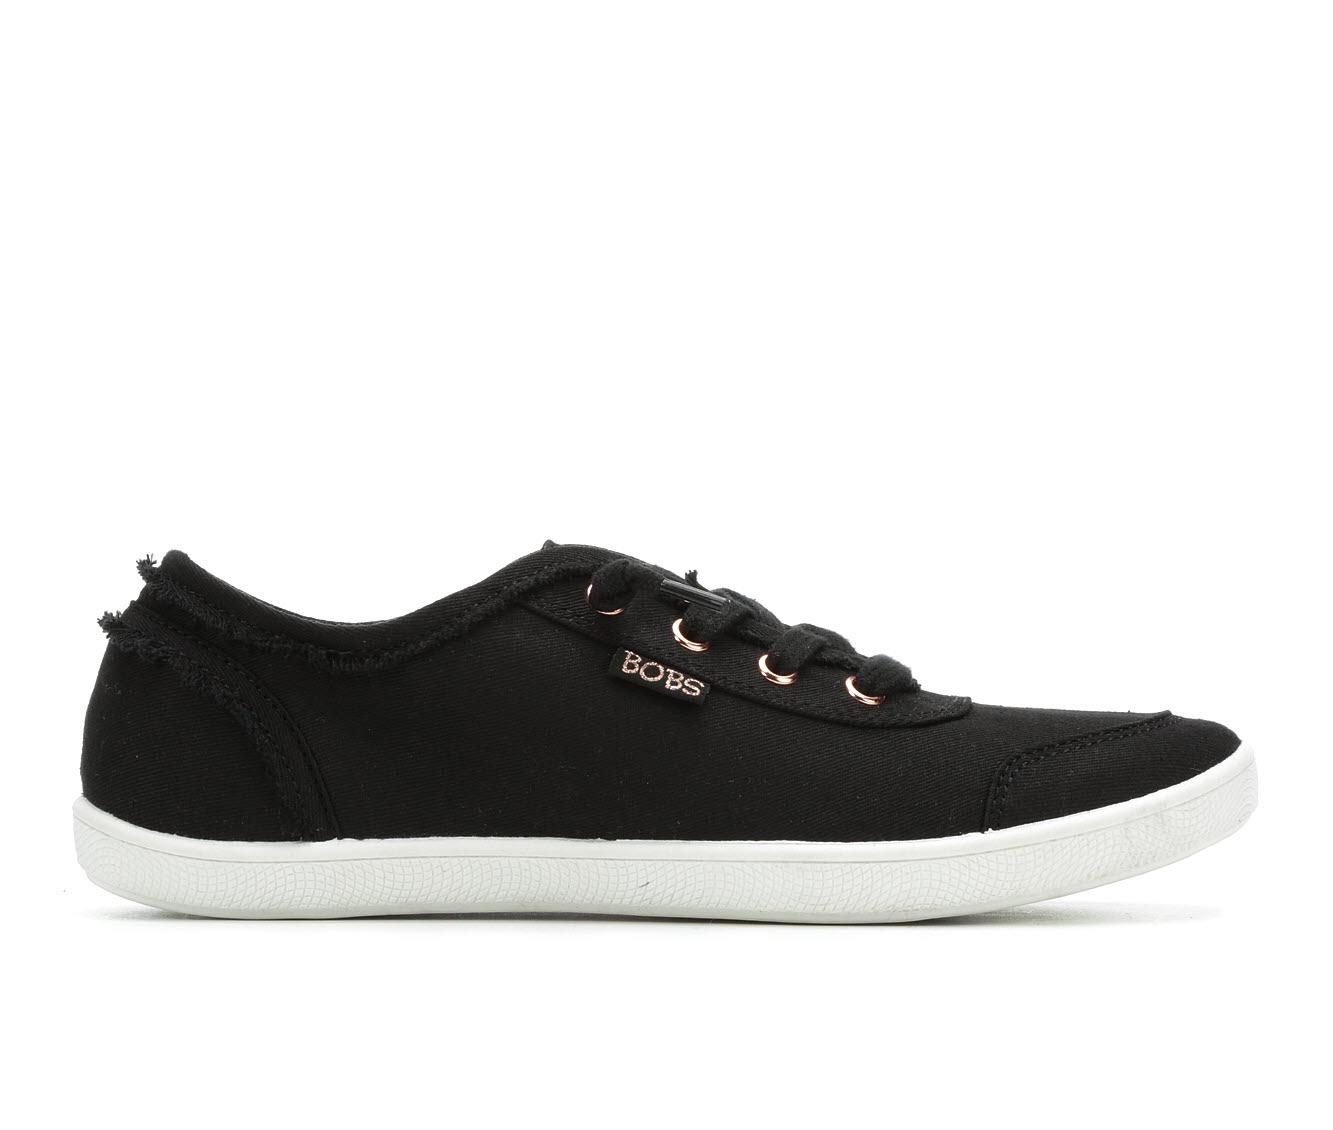 BOBS B Cute Women's Shoe (Black Canvas)